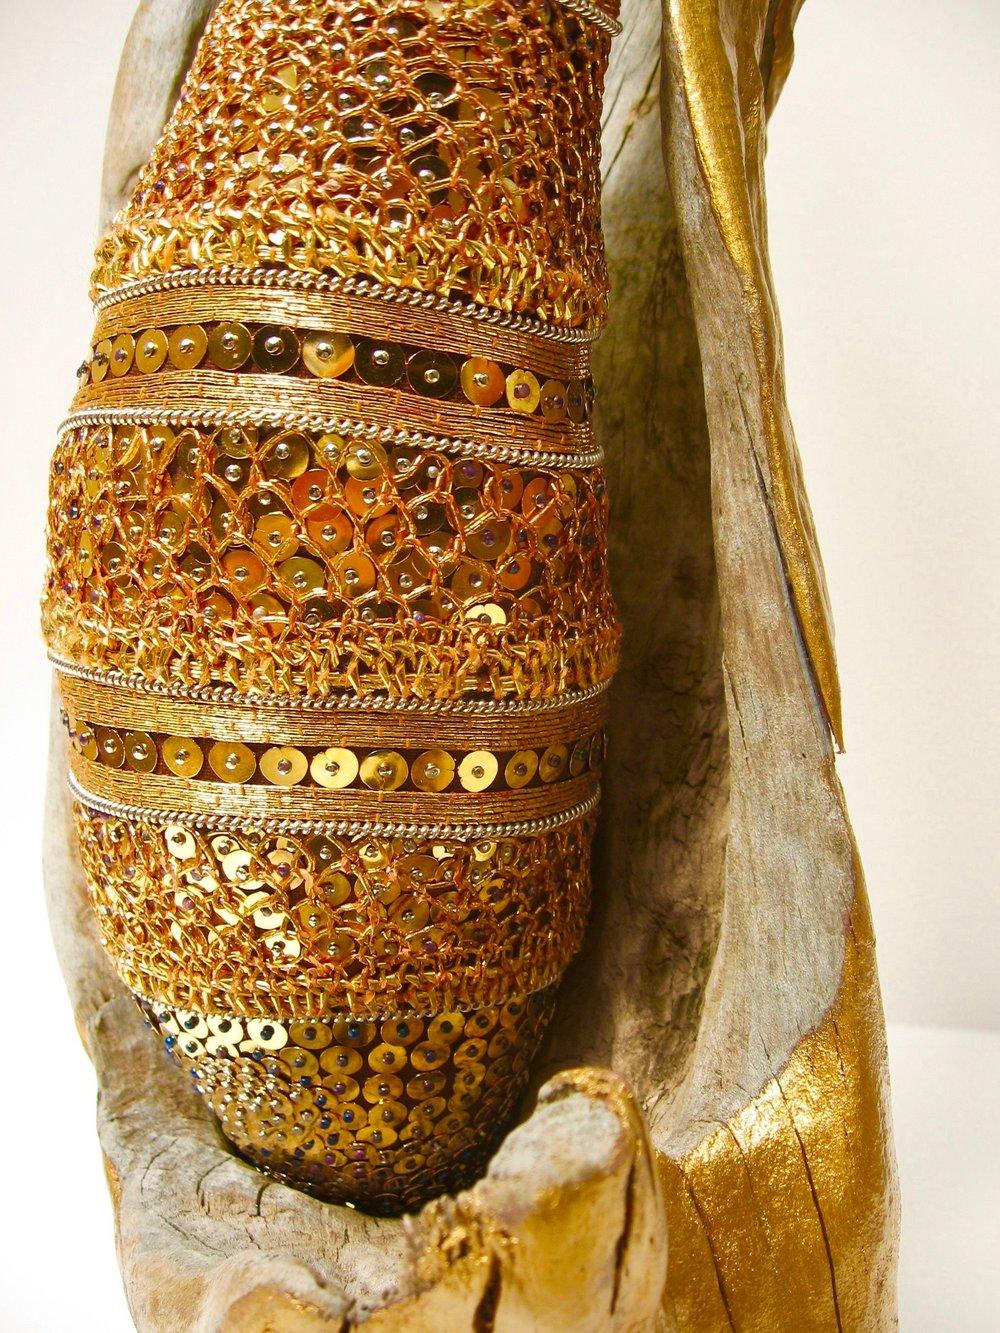 2009 B 'El Dorado' Close-up.jpg